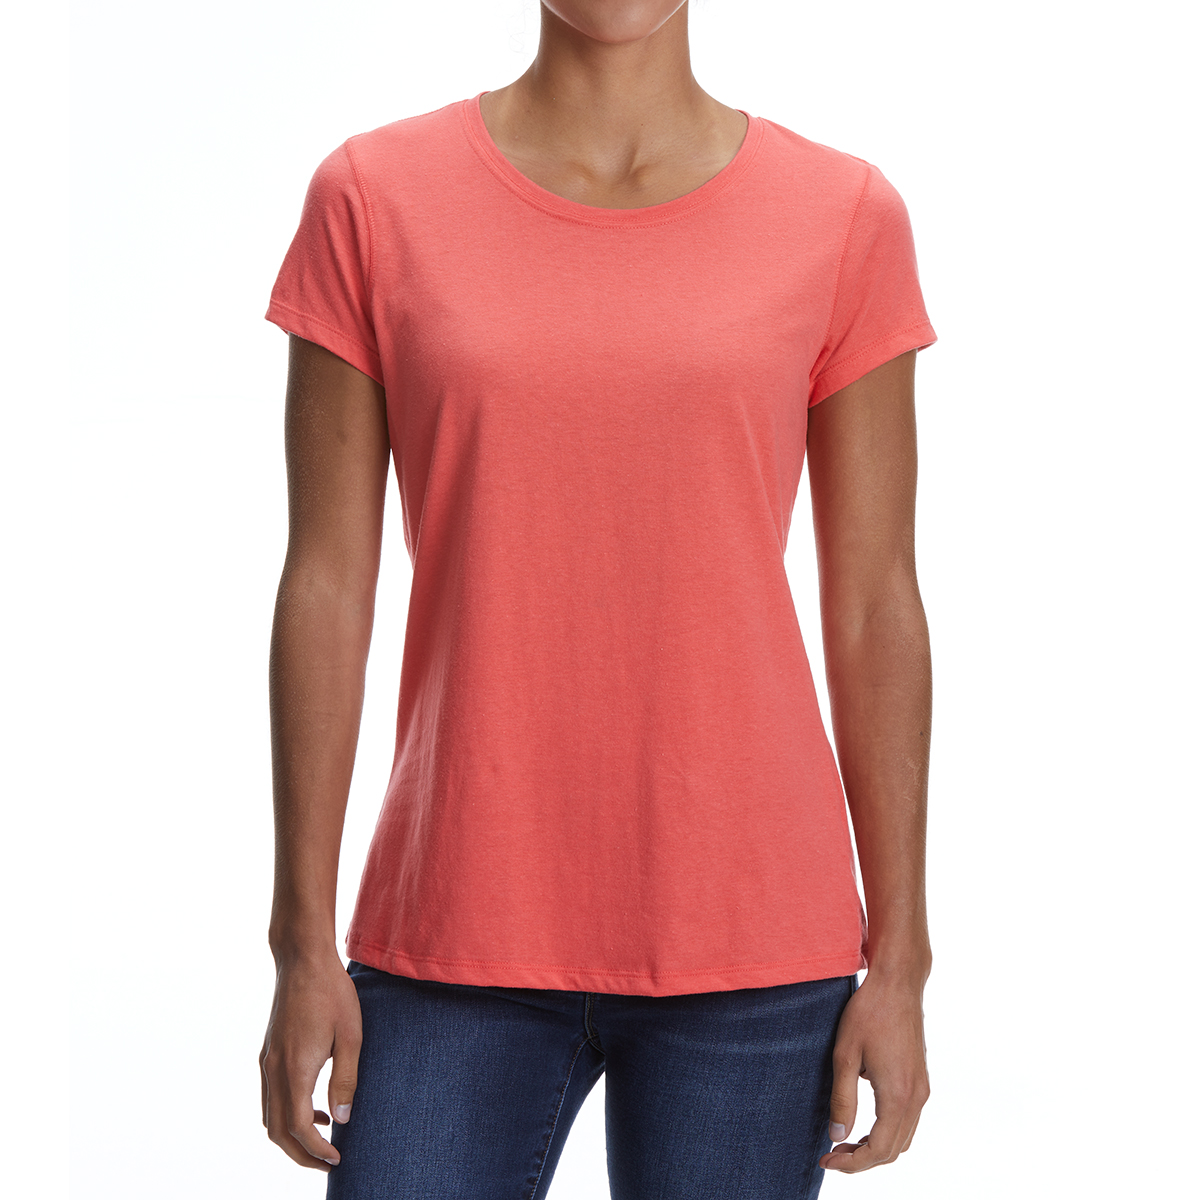 Columbia Women's Solar Shield Short-Sleeve Shirt - Red, M